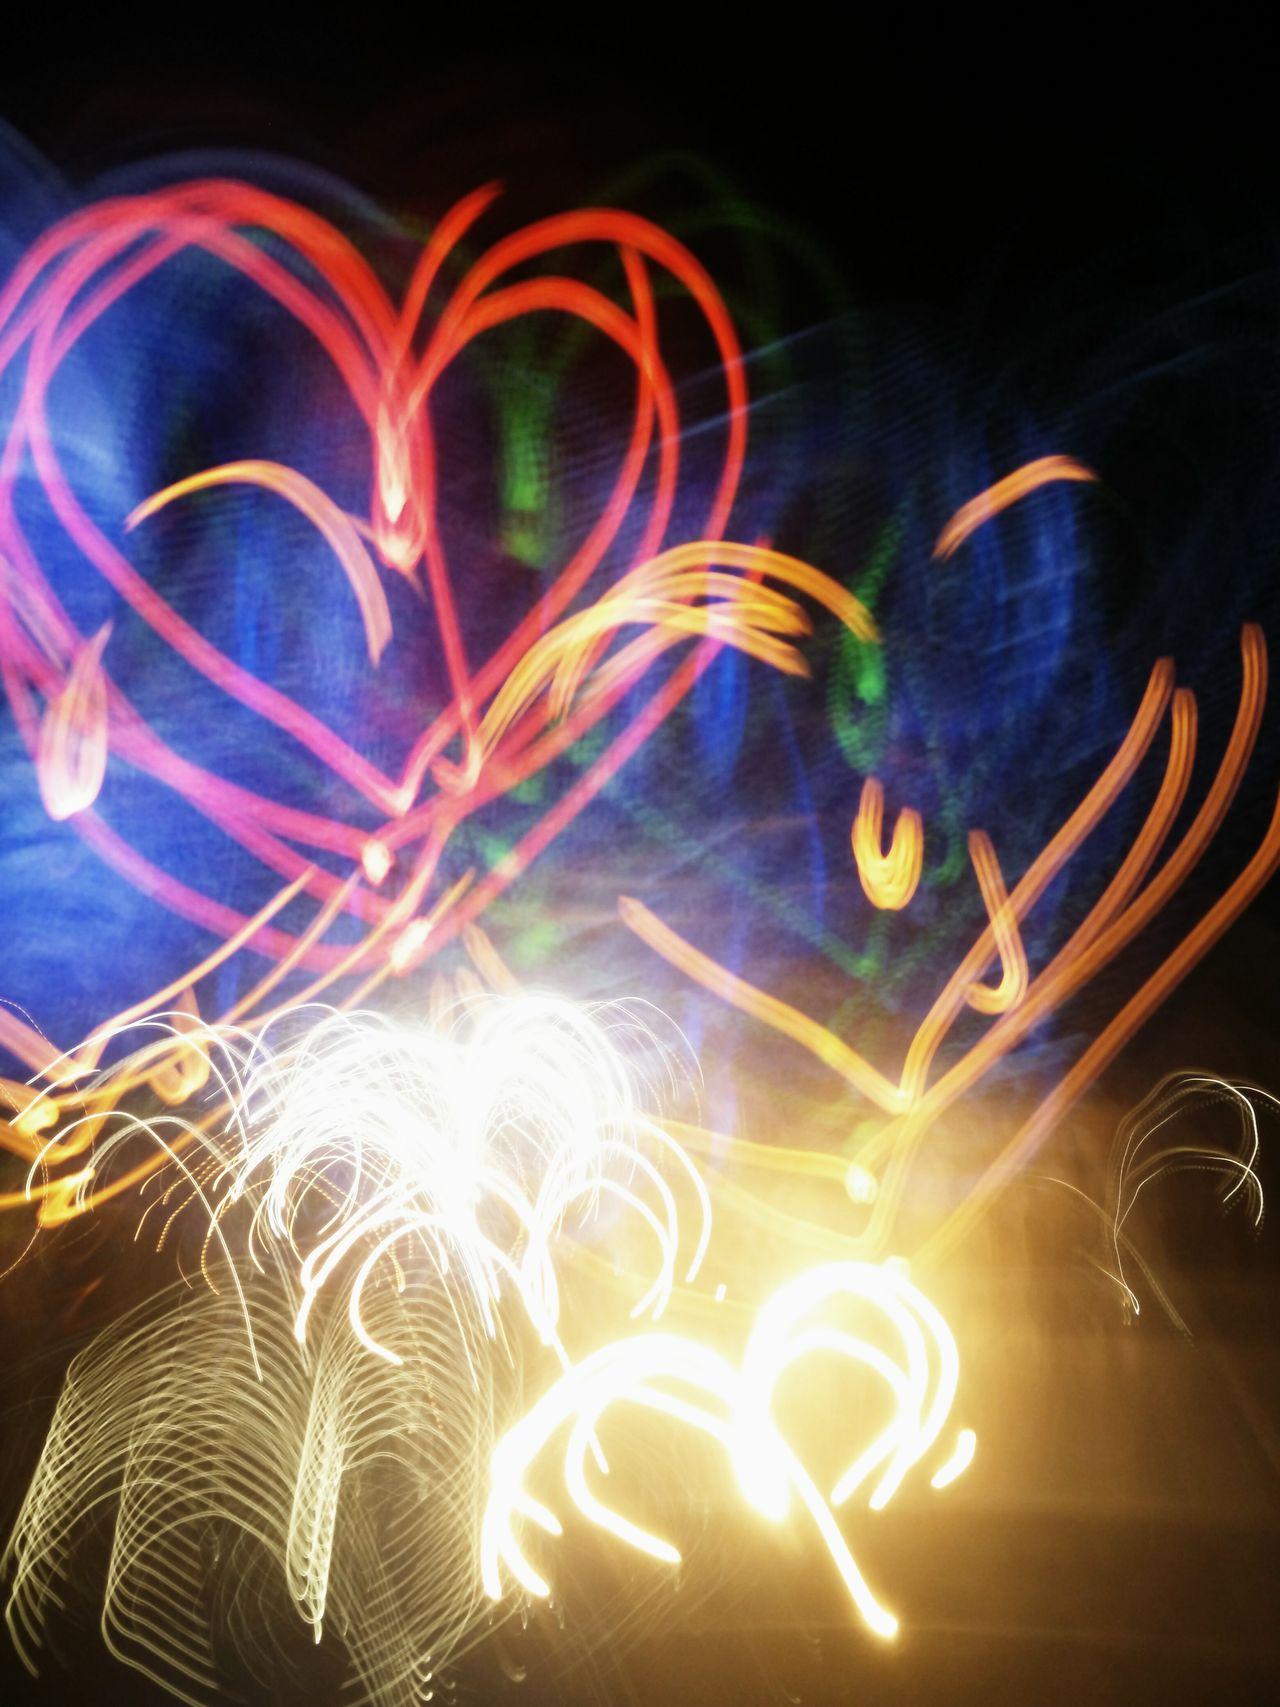 Showcase March Q Light Drawing Neon Lights Heartshape Rainbow Colors Multiple Layers Fun Photo Enjoying The Moment Life Is Simple Full Of Joy Original Photo